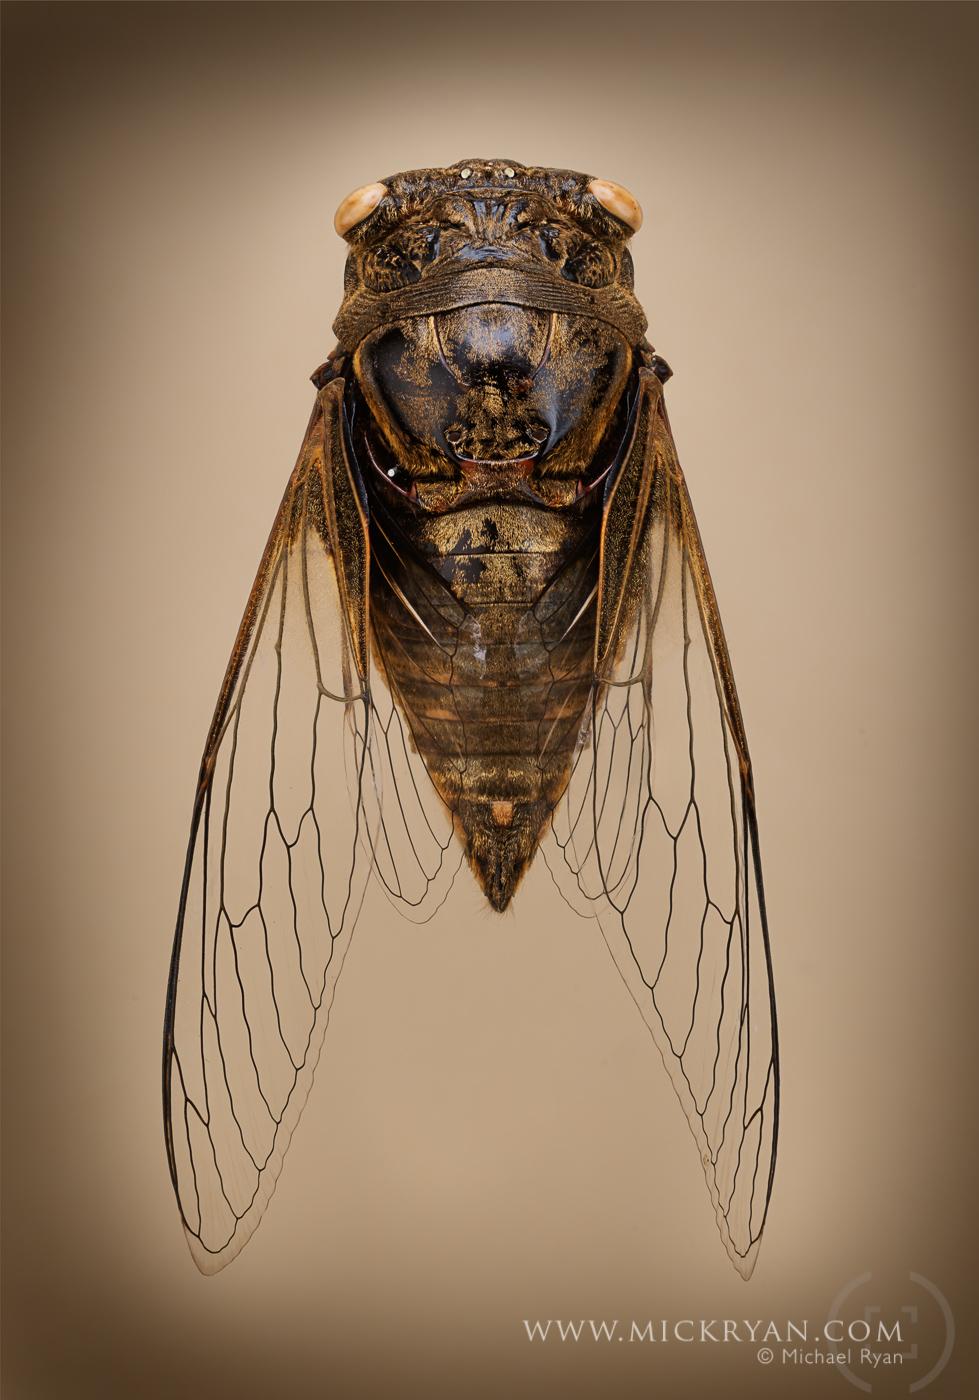 Cicada wings spread-3203-Edit.jpg